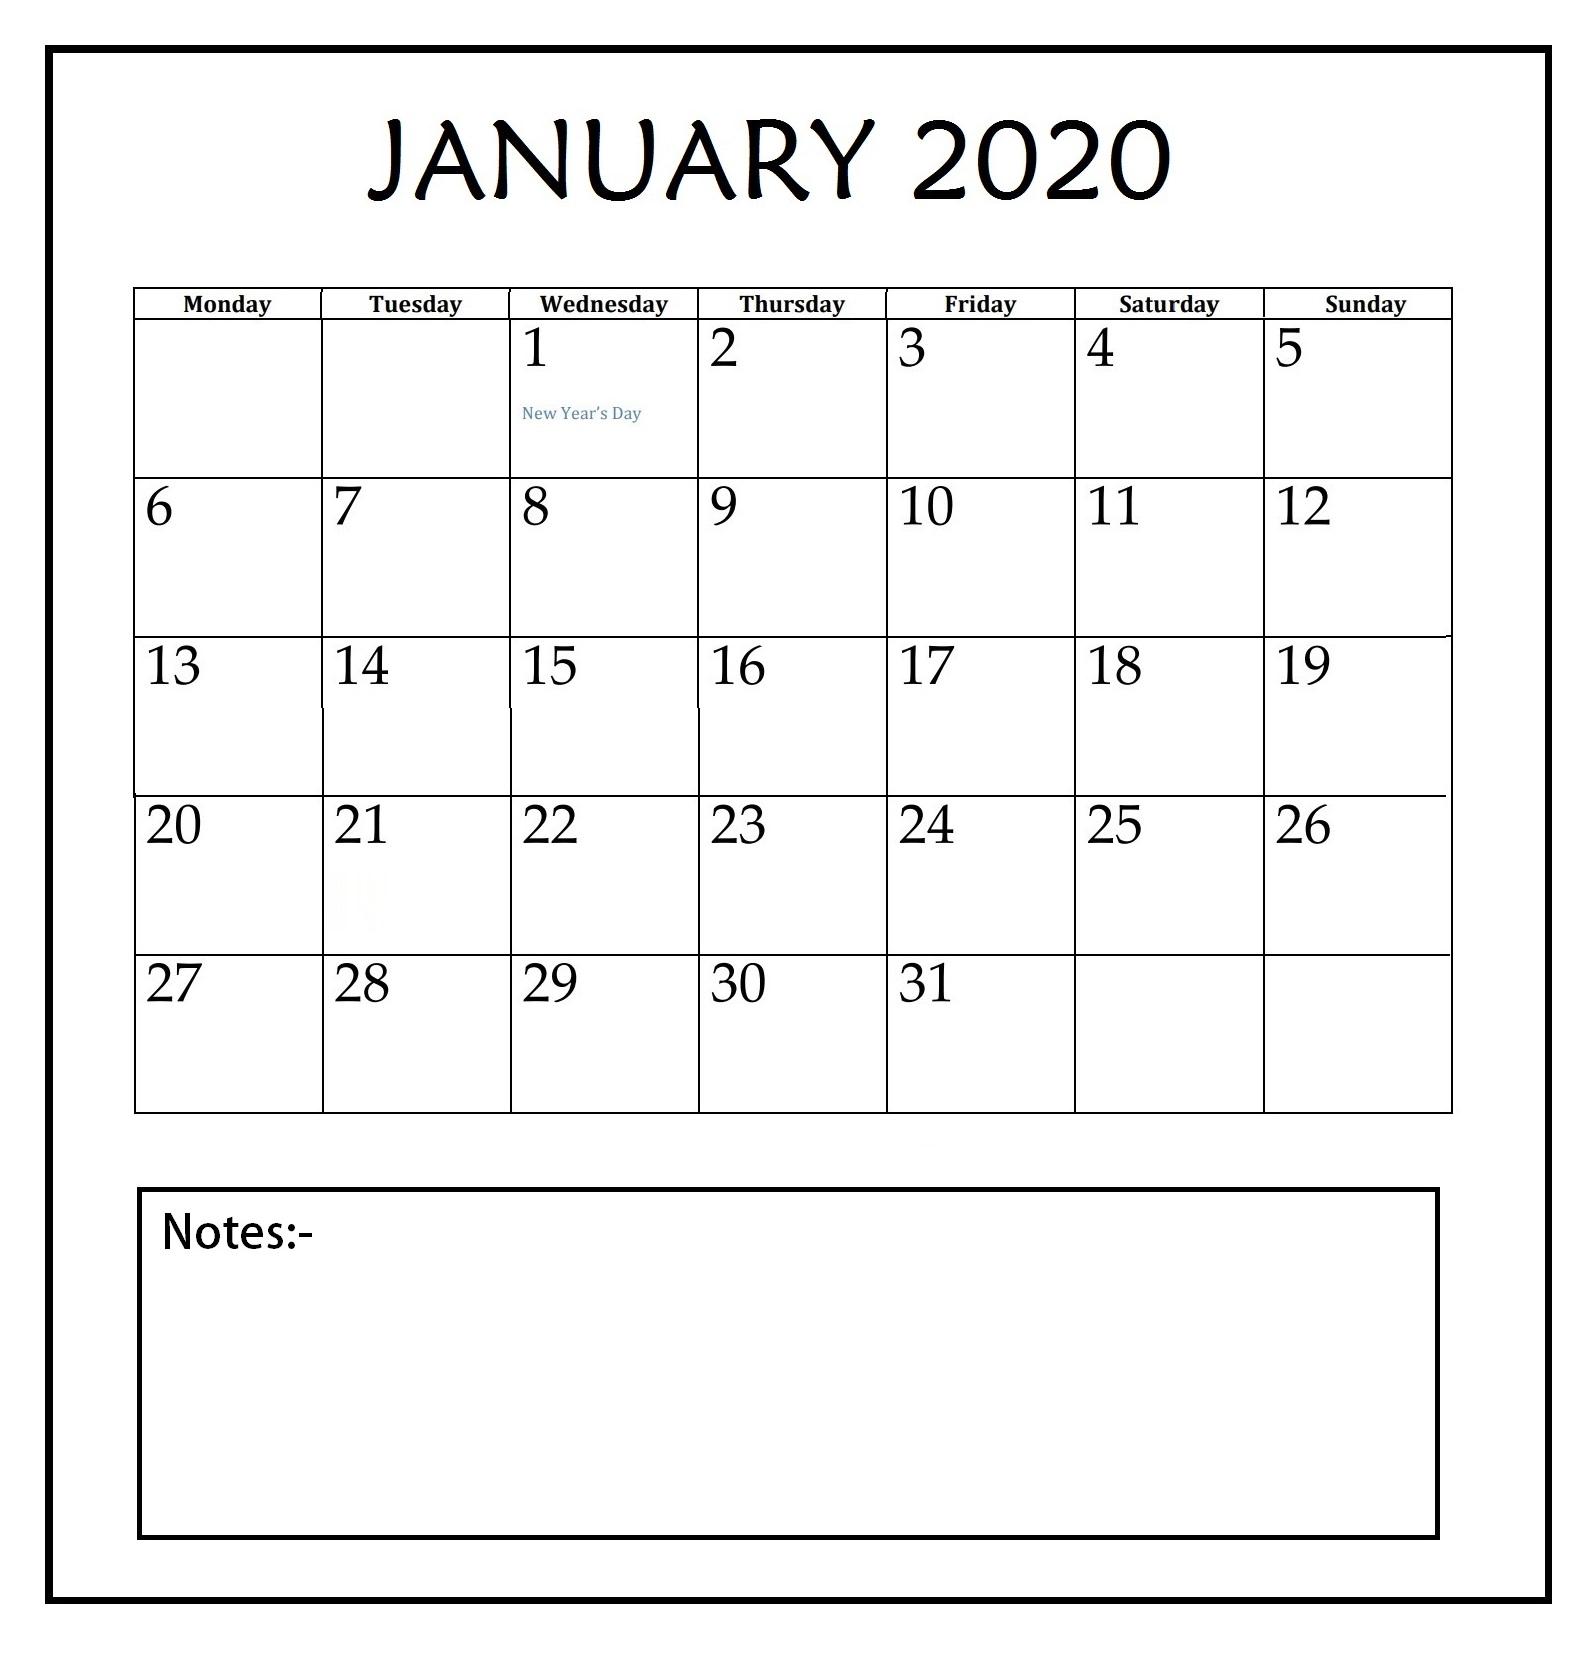 January 2020 Blank Template